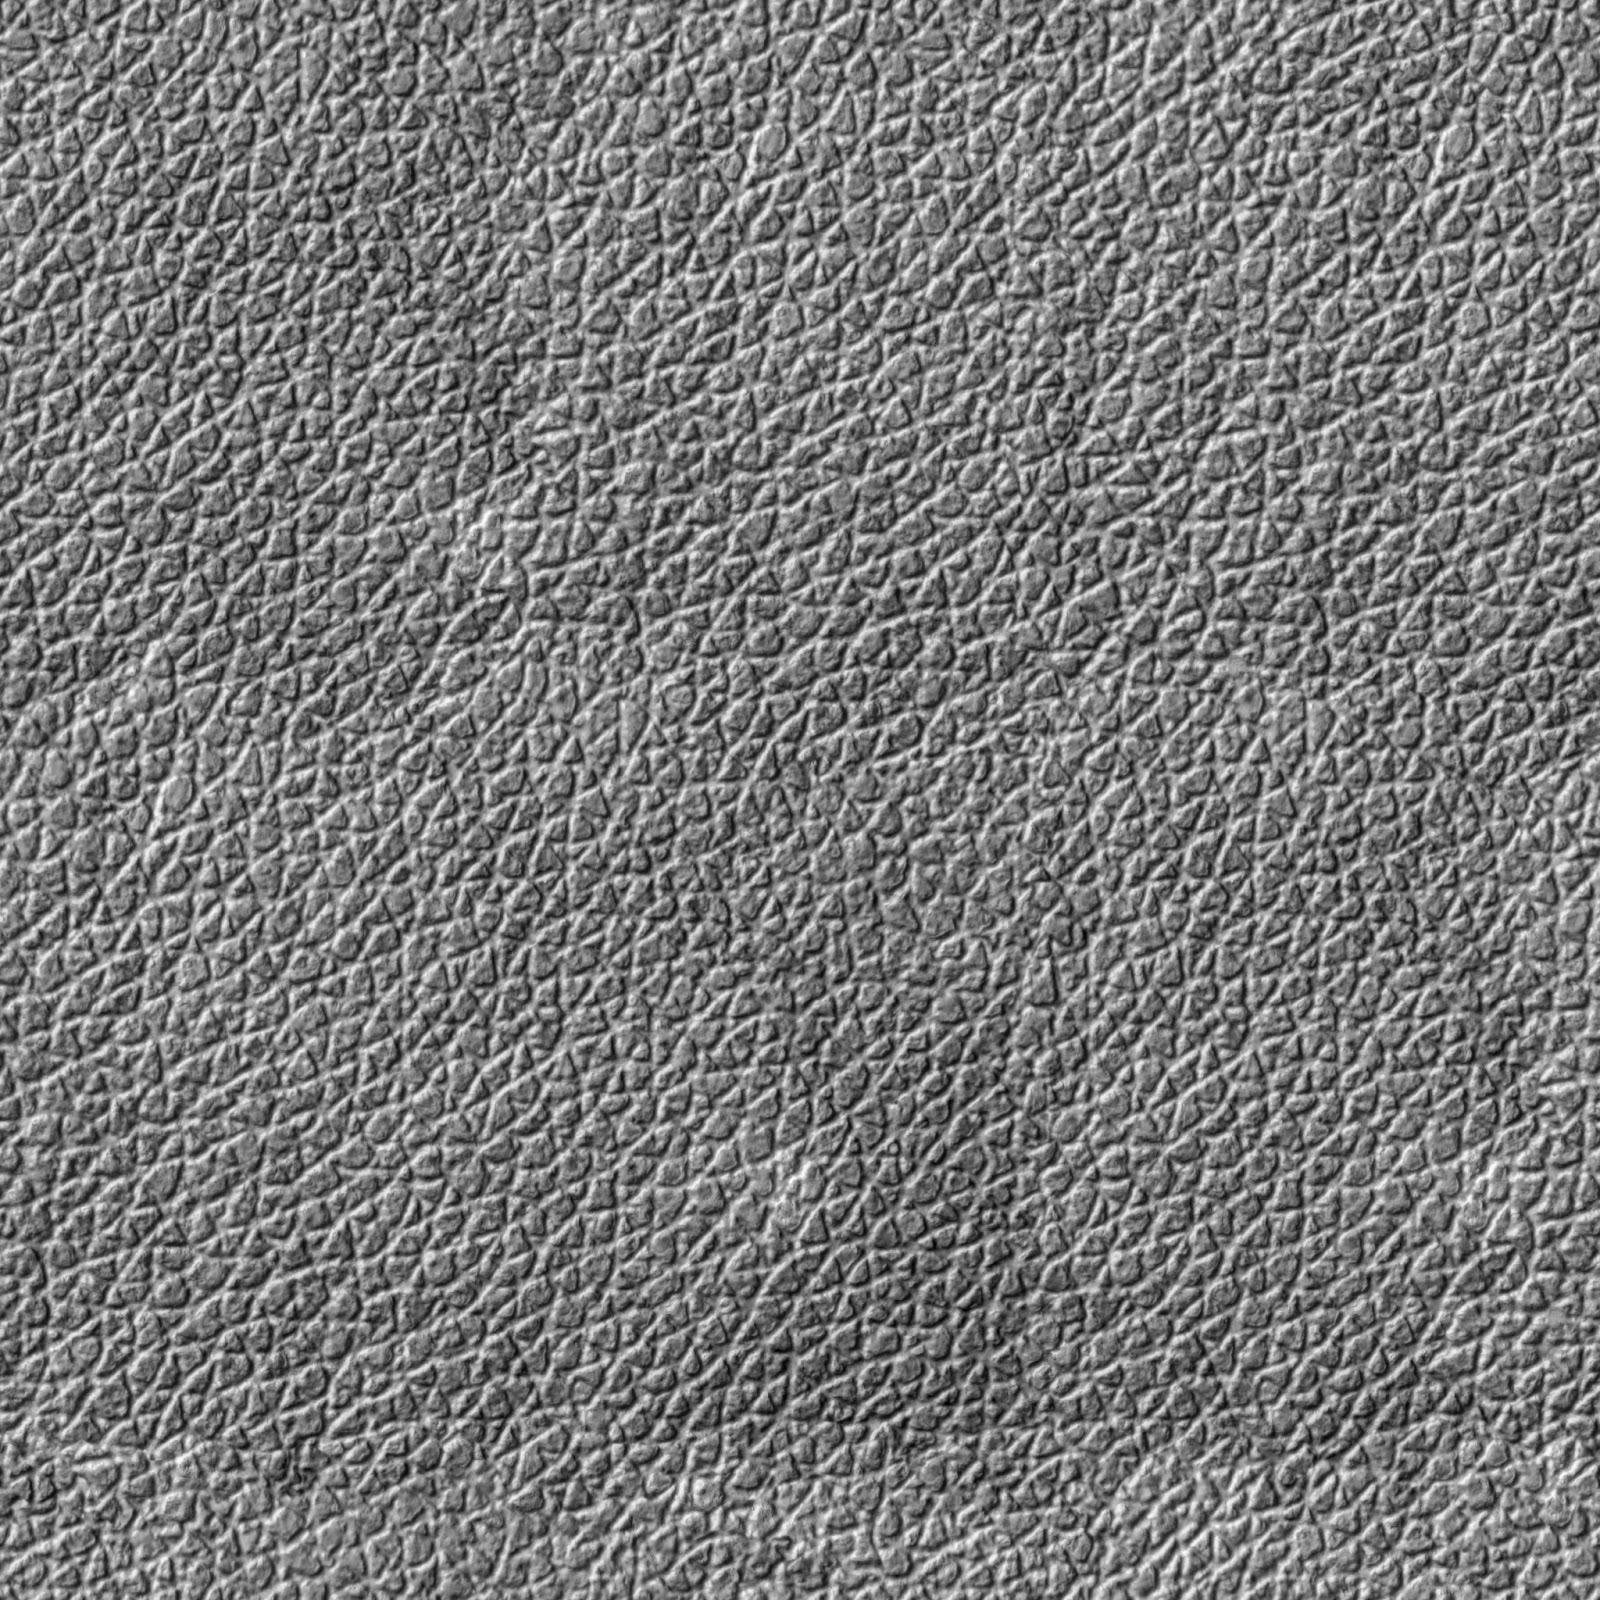 Seamless Black Leather Texture Maps Texturise Free